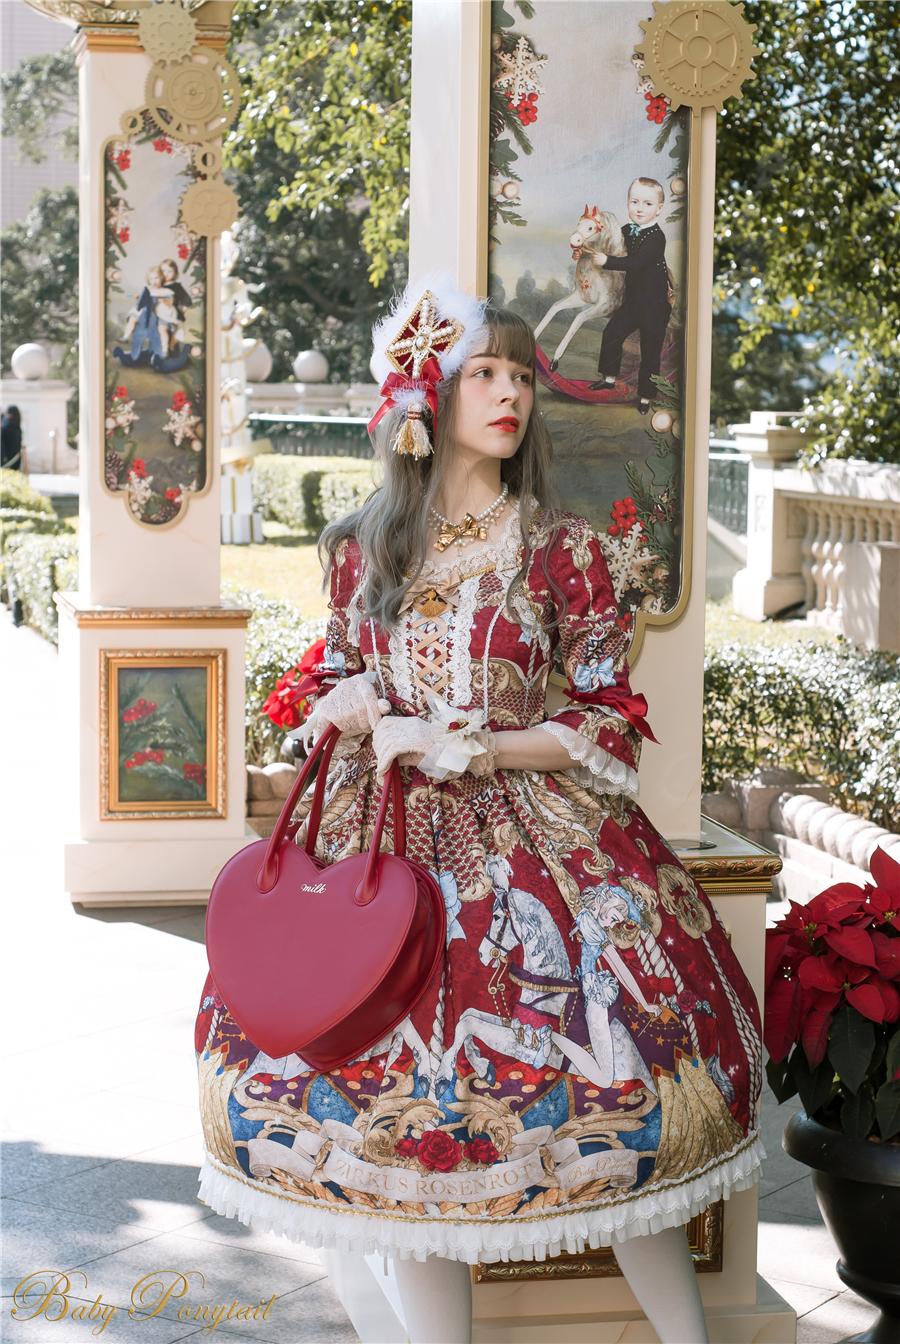 Baby Ponytail_Circus Princess_Red OP_Claudia_23.jpg